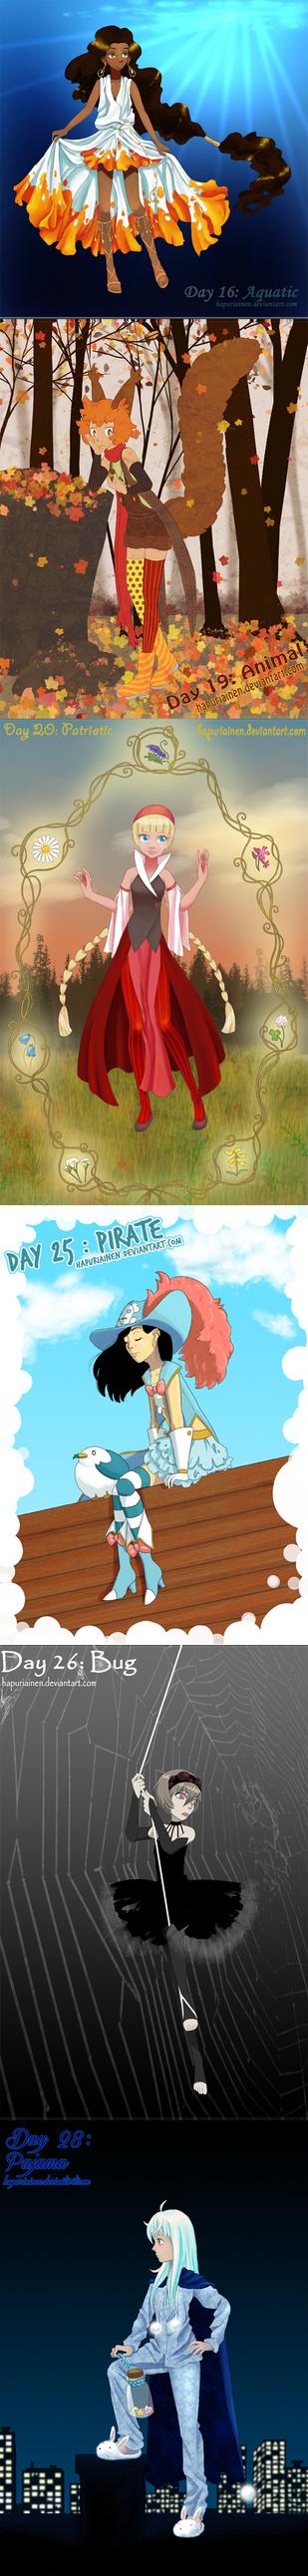 Magical Girl Challenge 3/3 by Hapuriainen